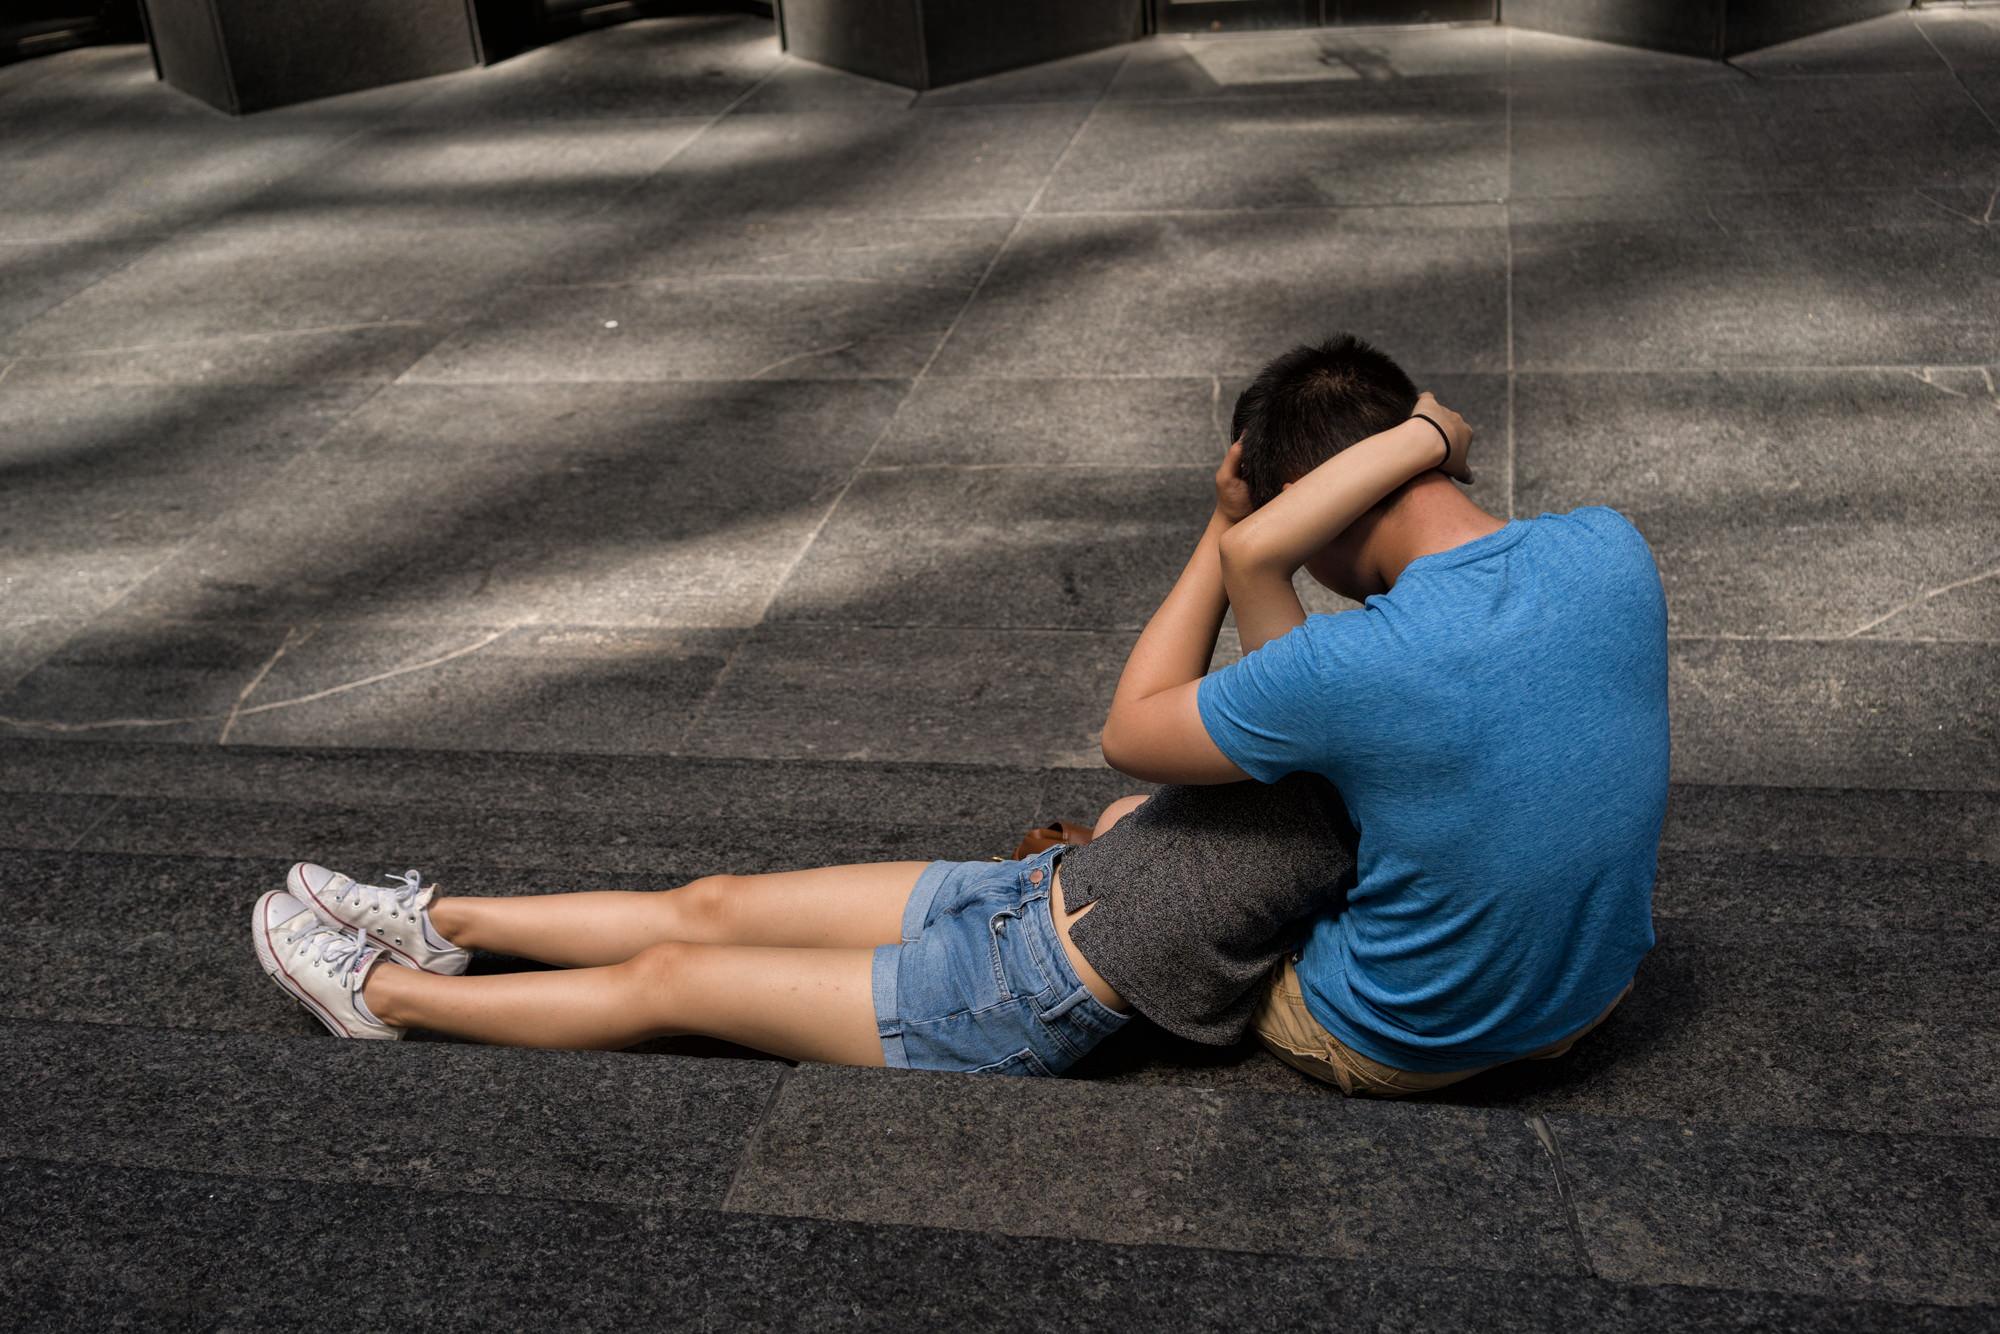 Melissa O'Shaughnessy – Perfect Strangers: New York City Street Photographs